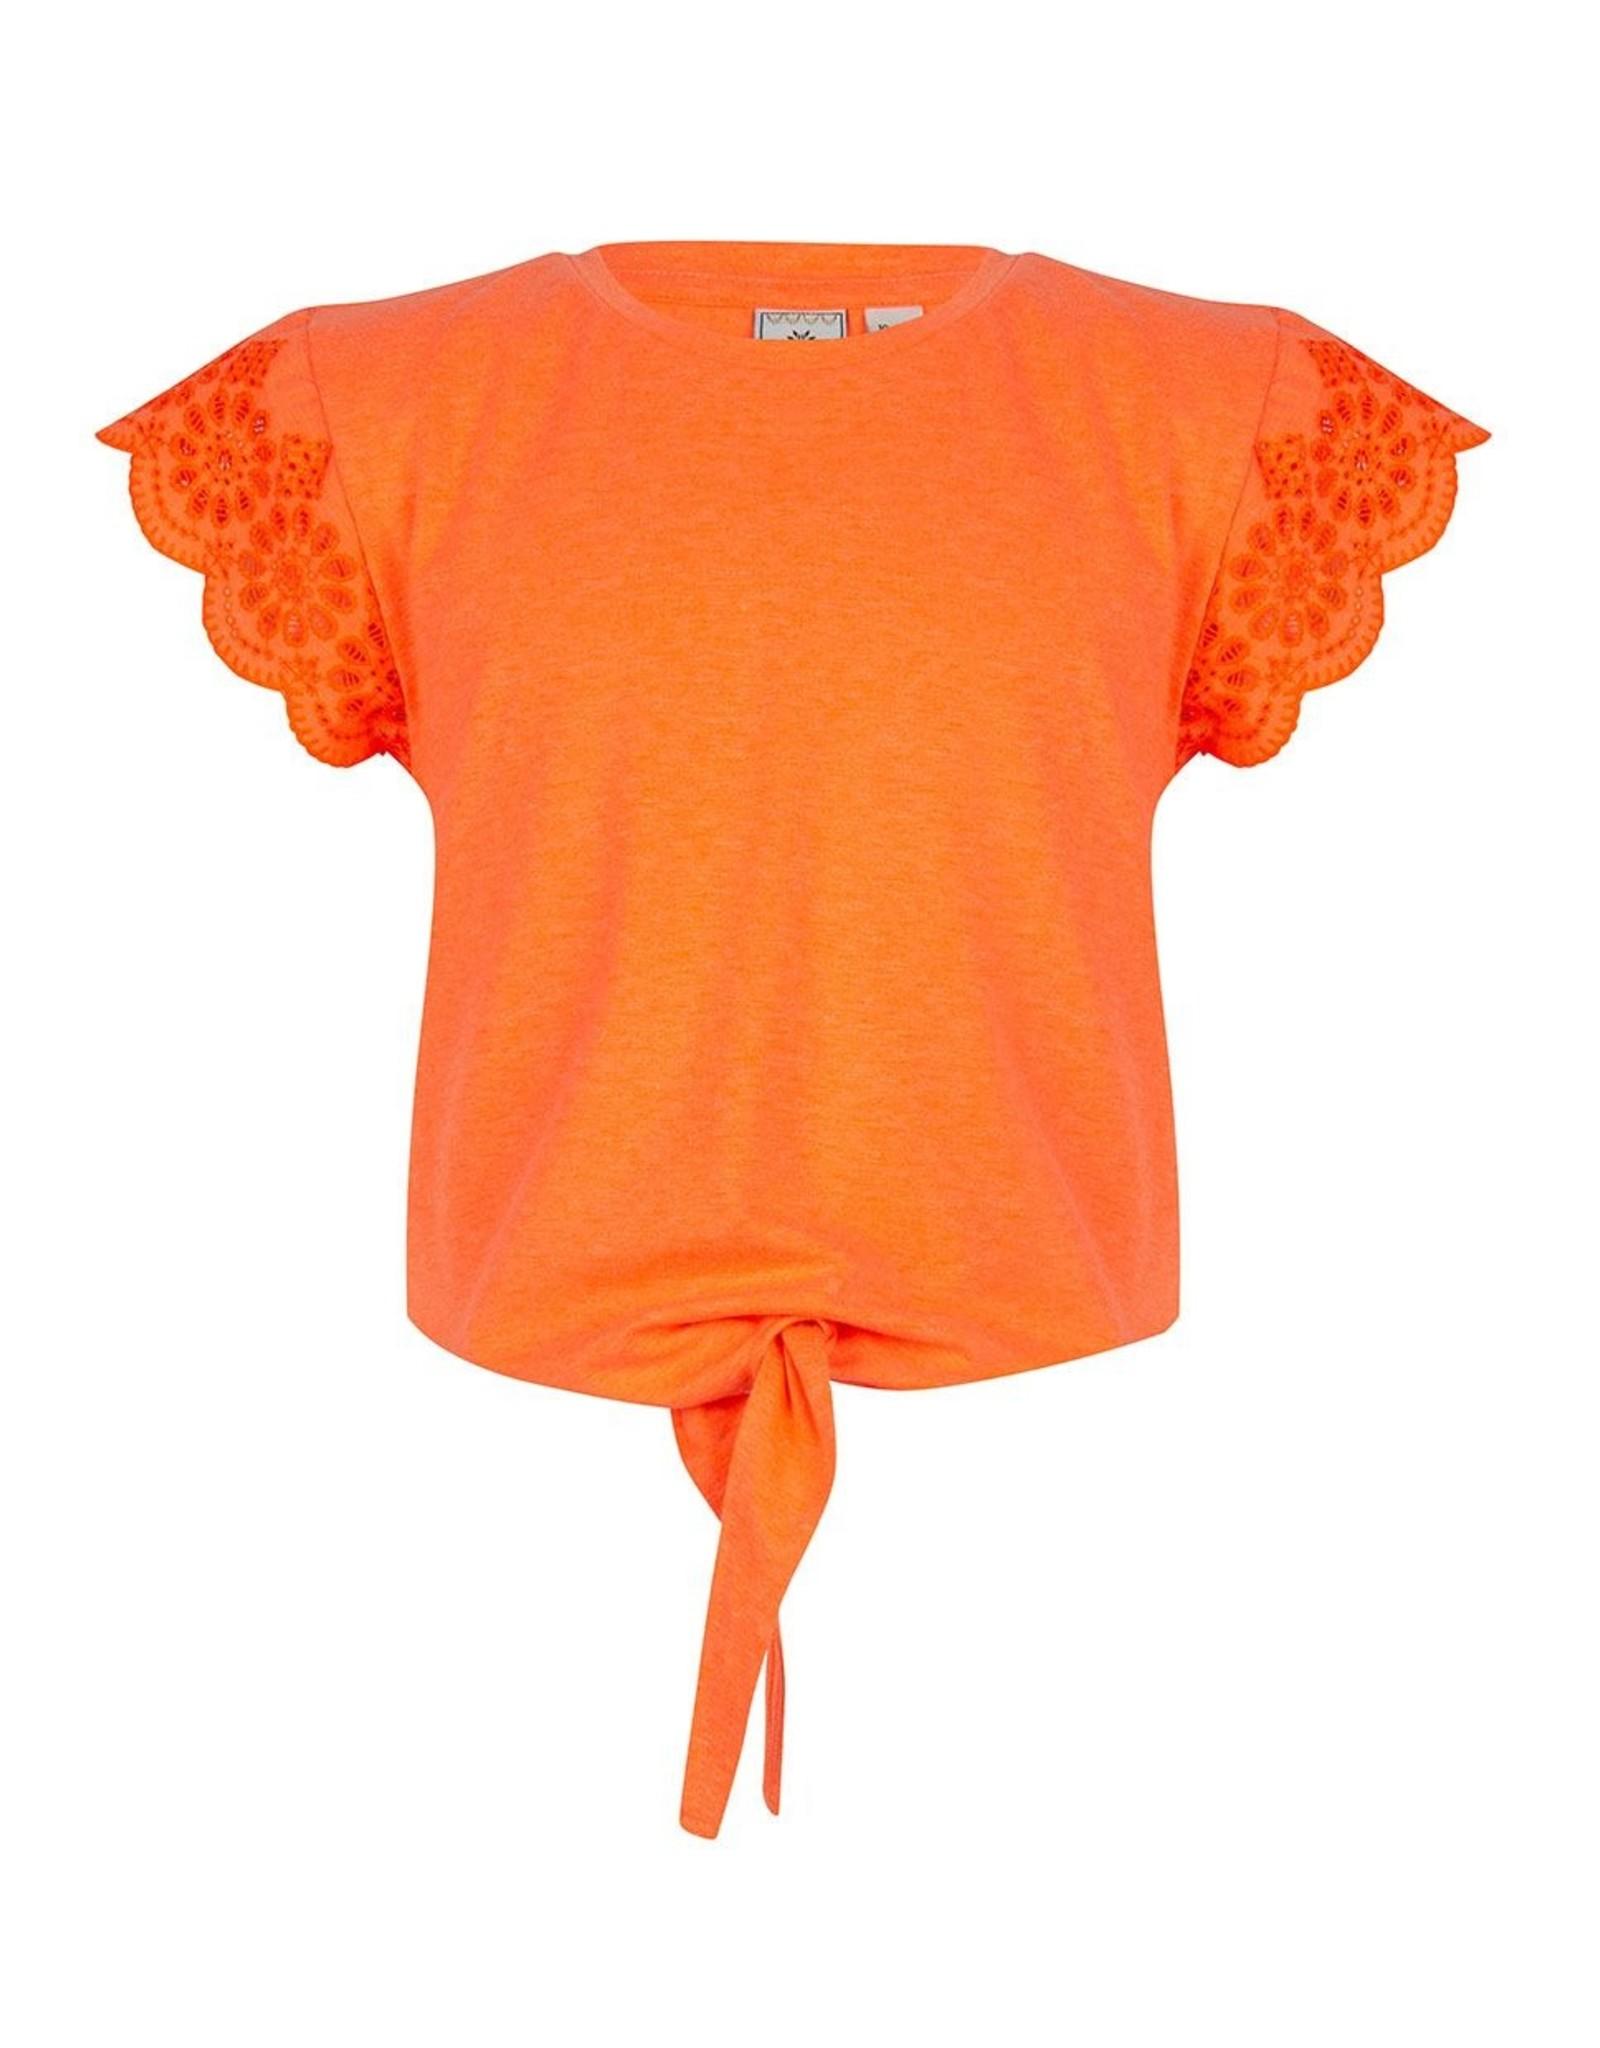 Indian Blue Jeans IBJ t-shirt broderie bright orange